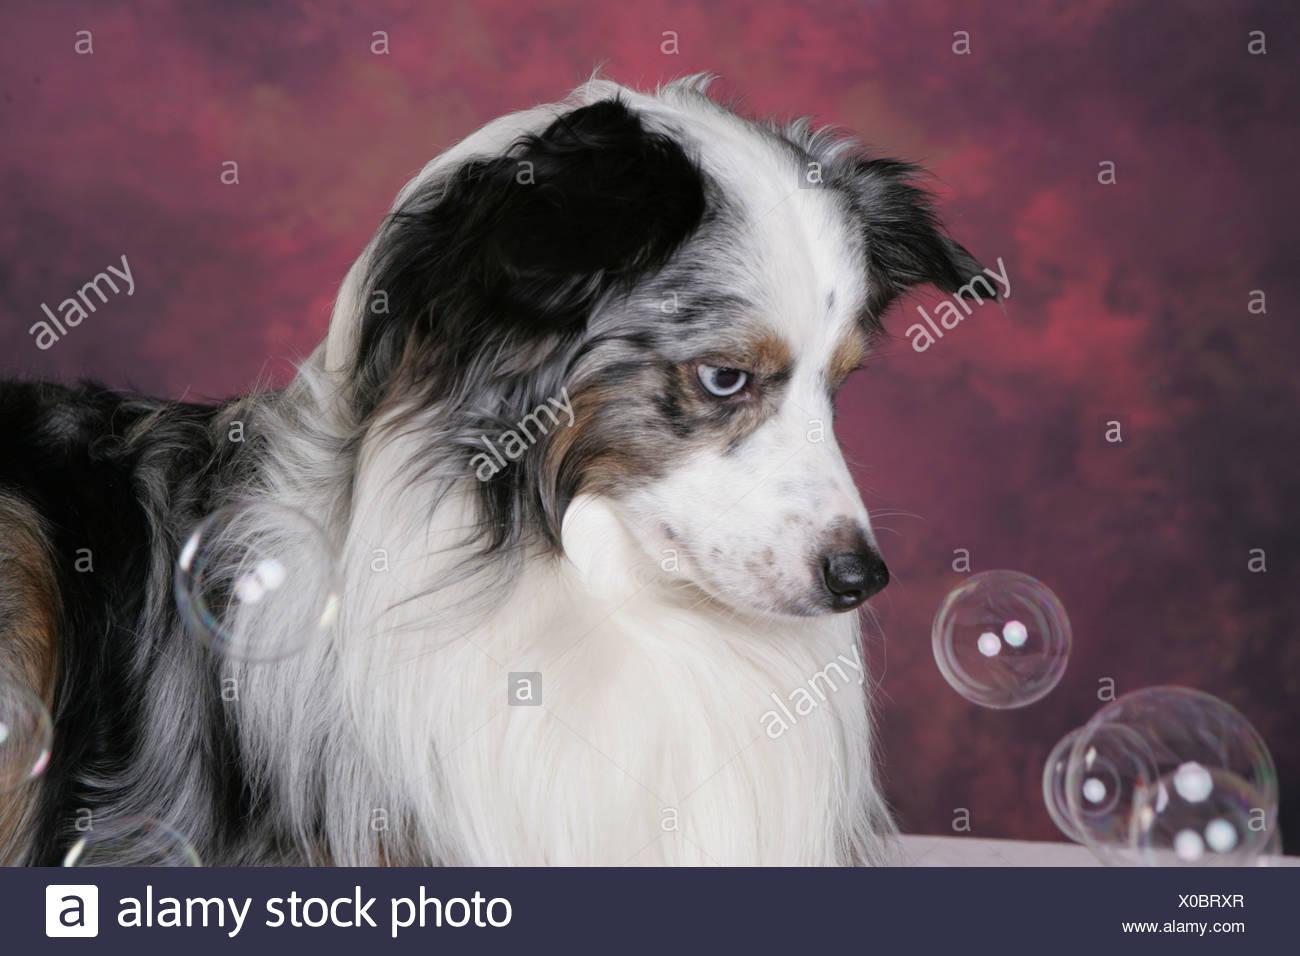 Miniature Australian Shepherd Portrait - Stock Image